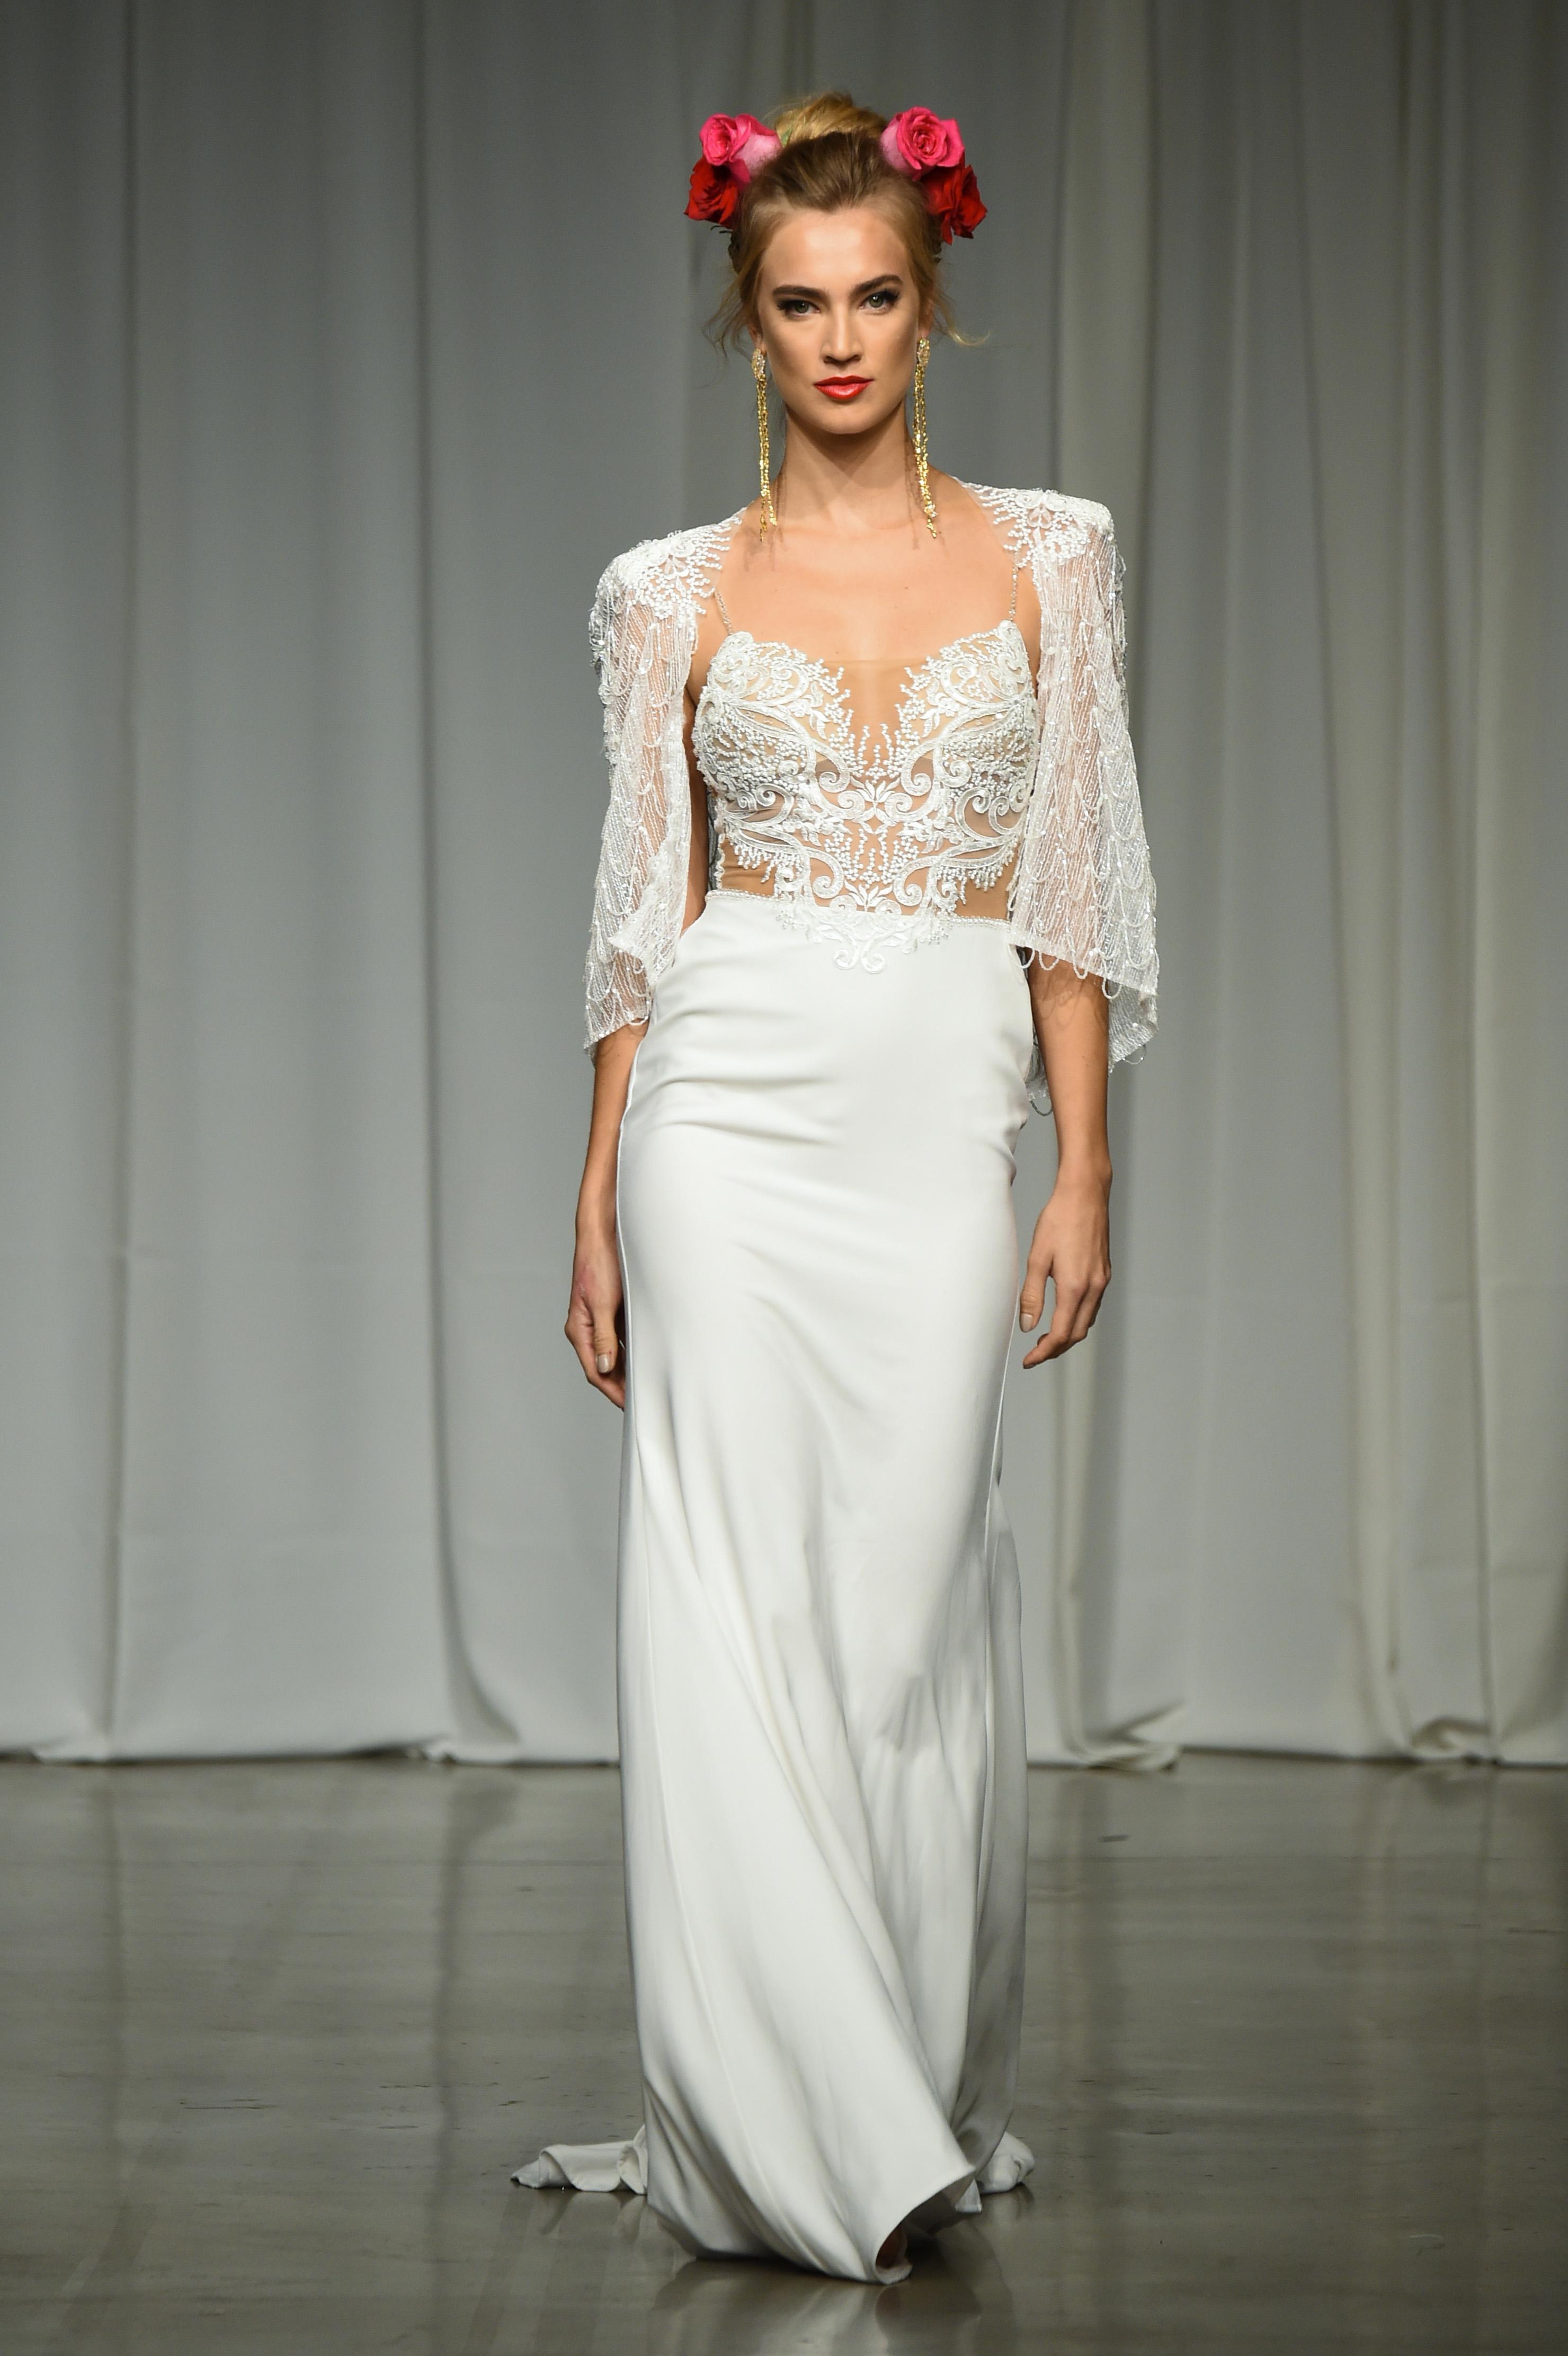 julie vino group fall 2019 sheath spaghetti strap jacket wedding dress